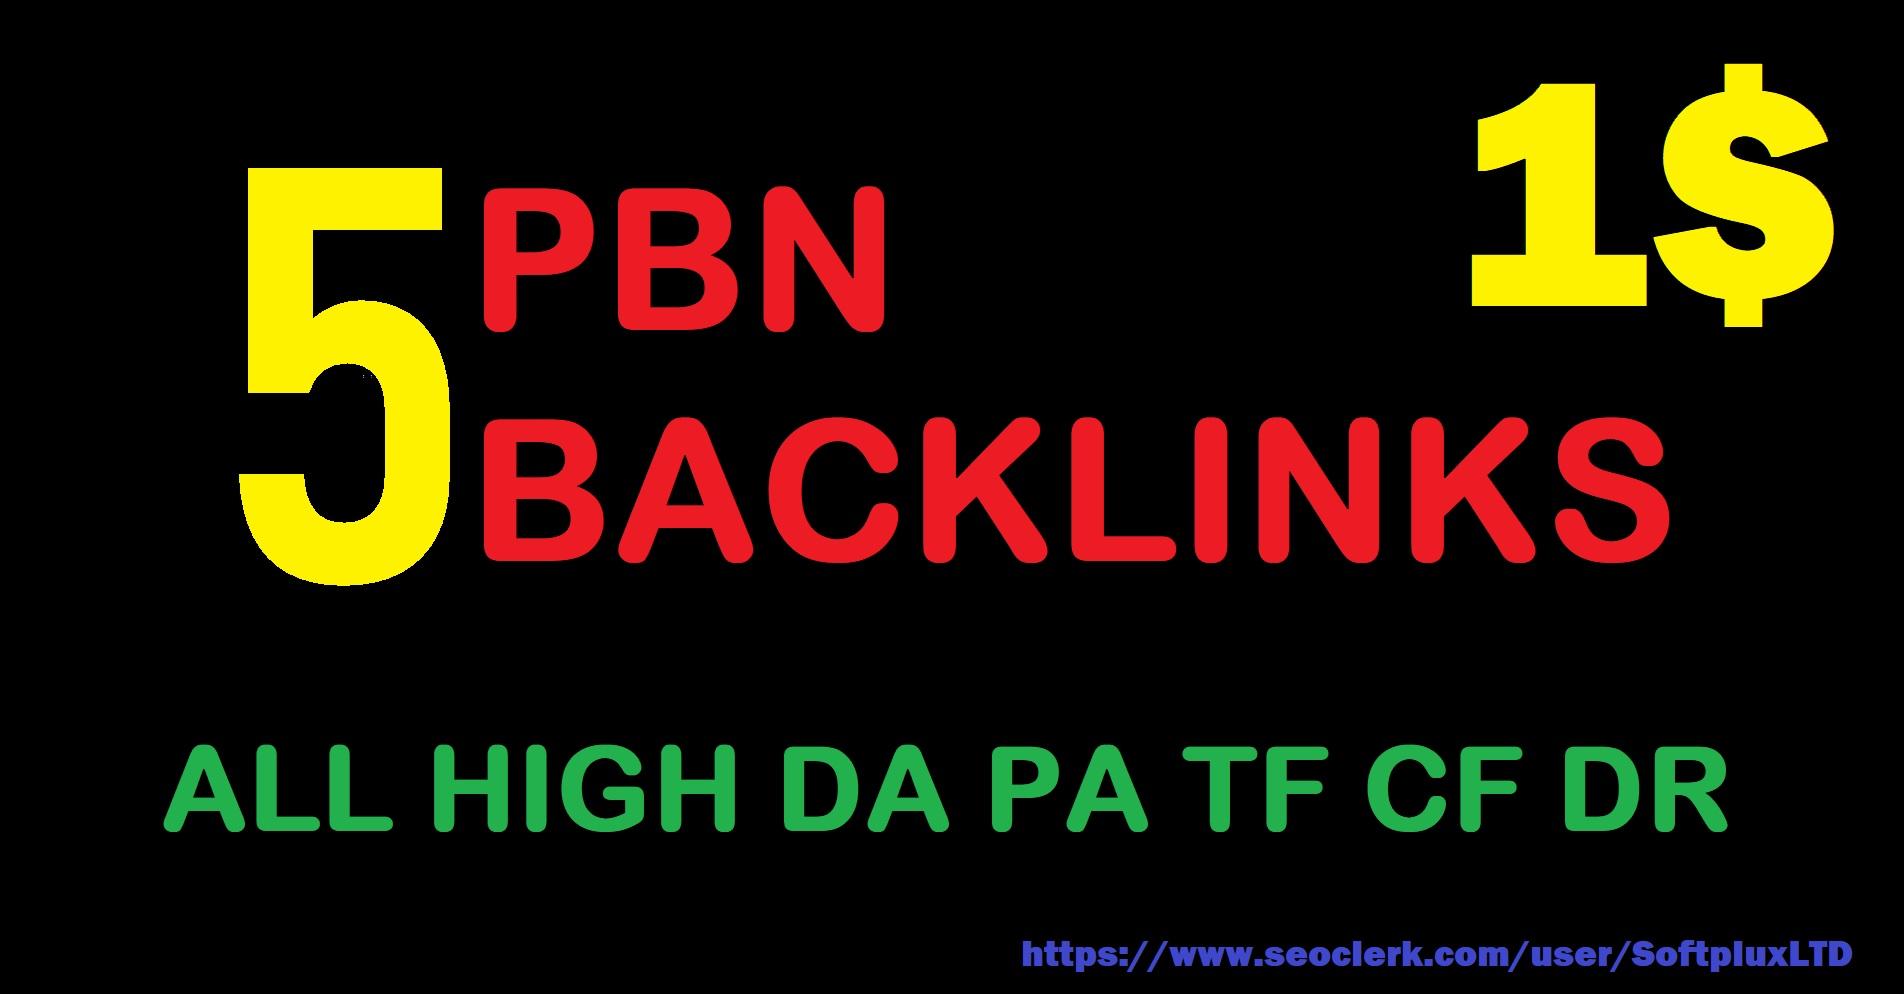 Make 5 High Quality PBN Backlinks With High DA PA TC CF